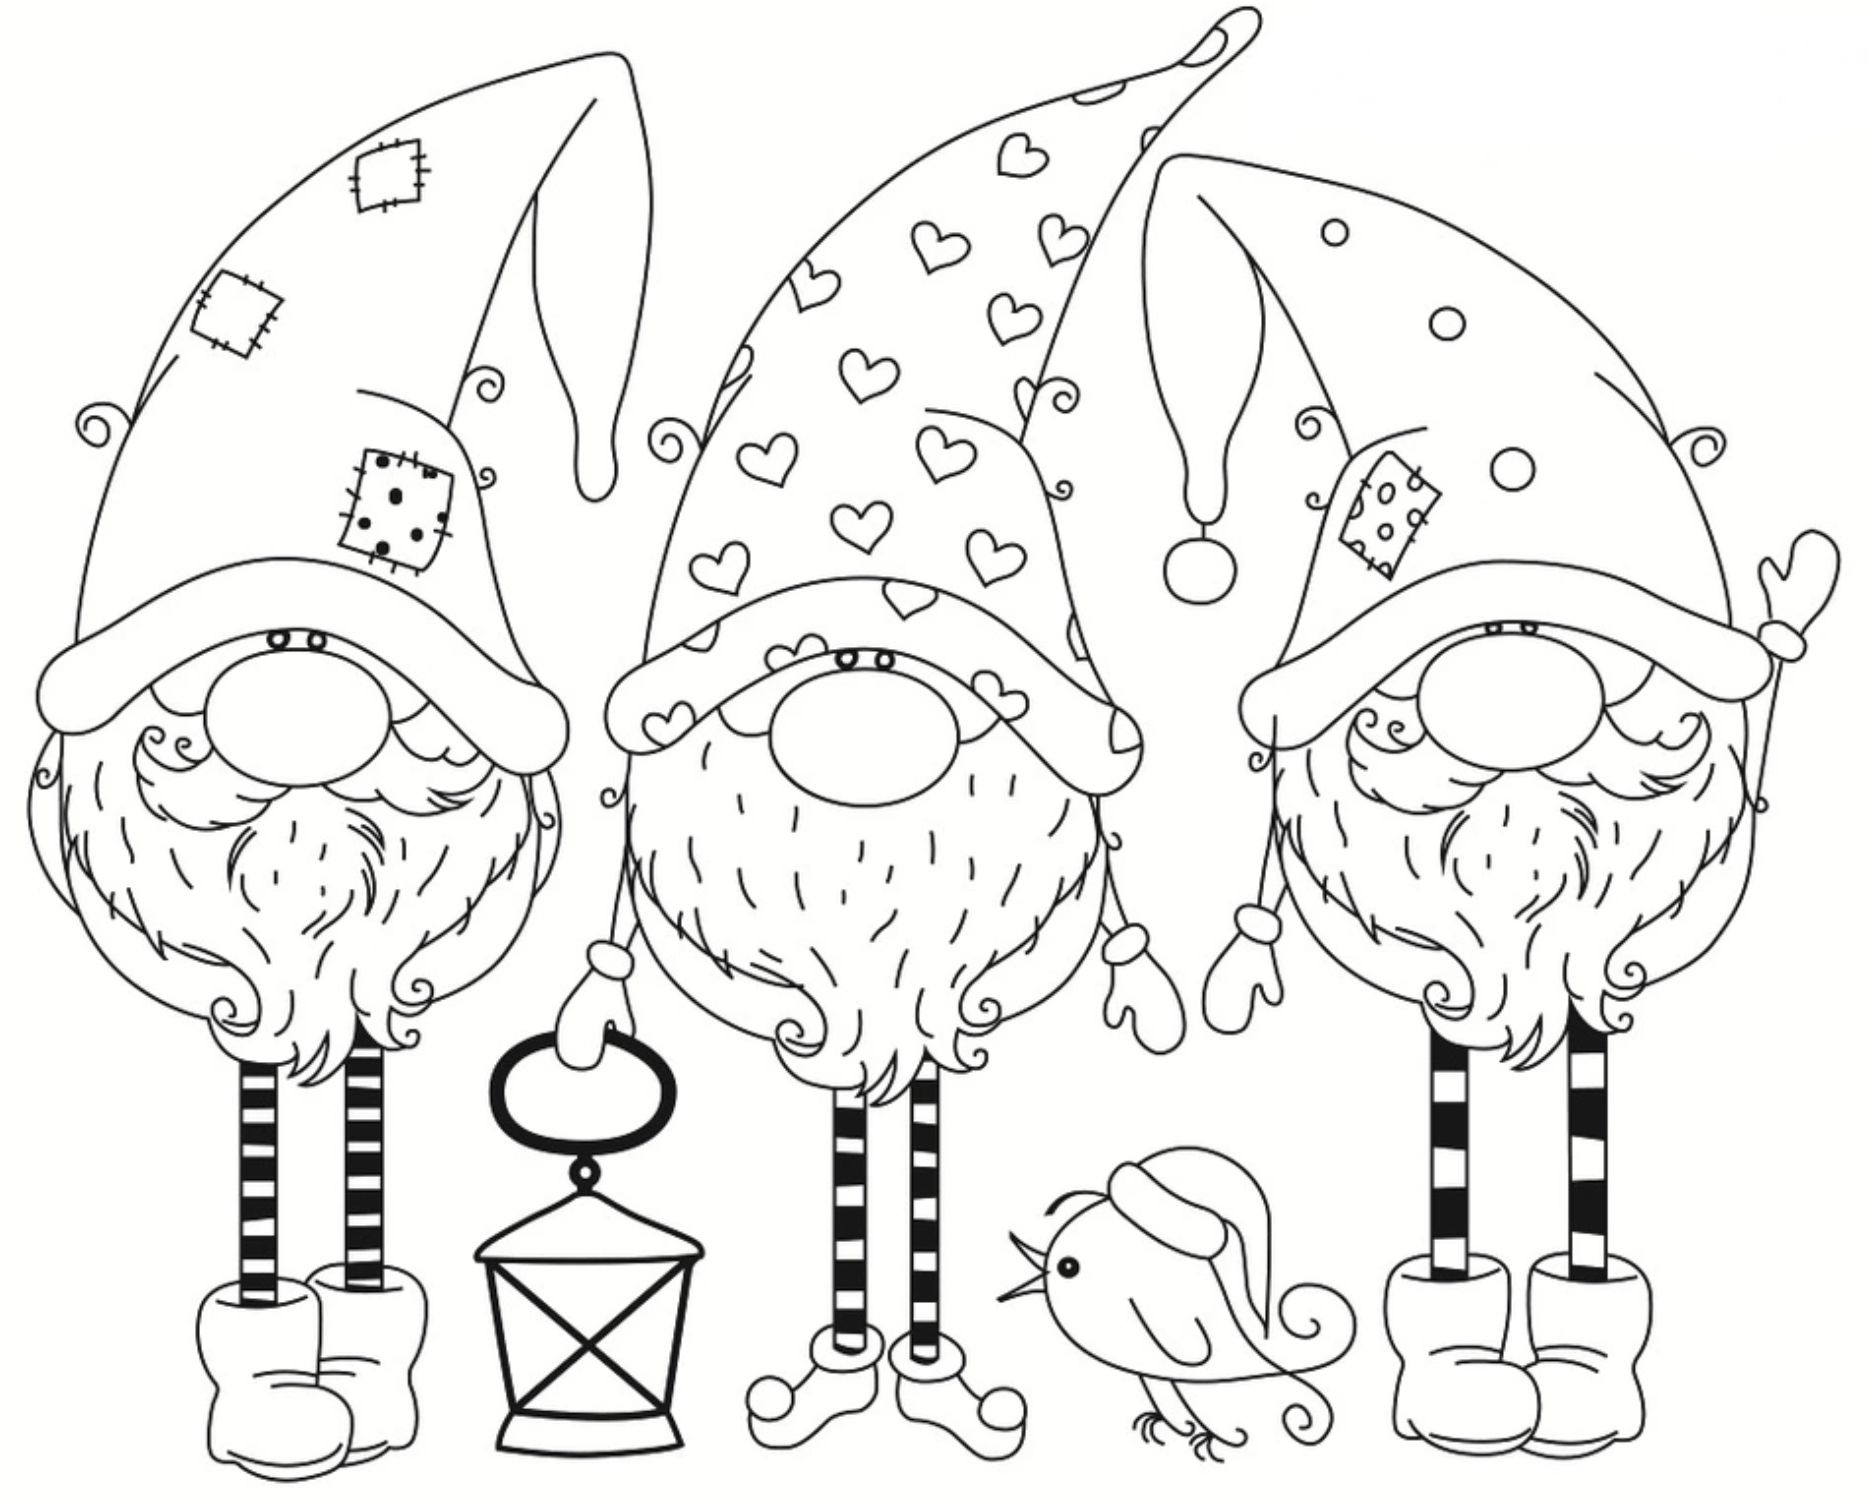 Pin By Milena Svrcinova On Omalovanky Christmas Coloring Pages Christmas Drawing Gnomes Crafts